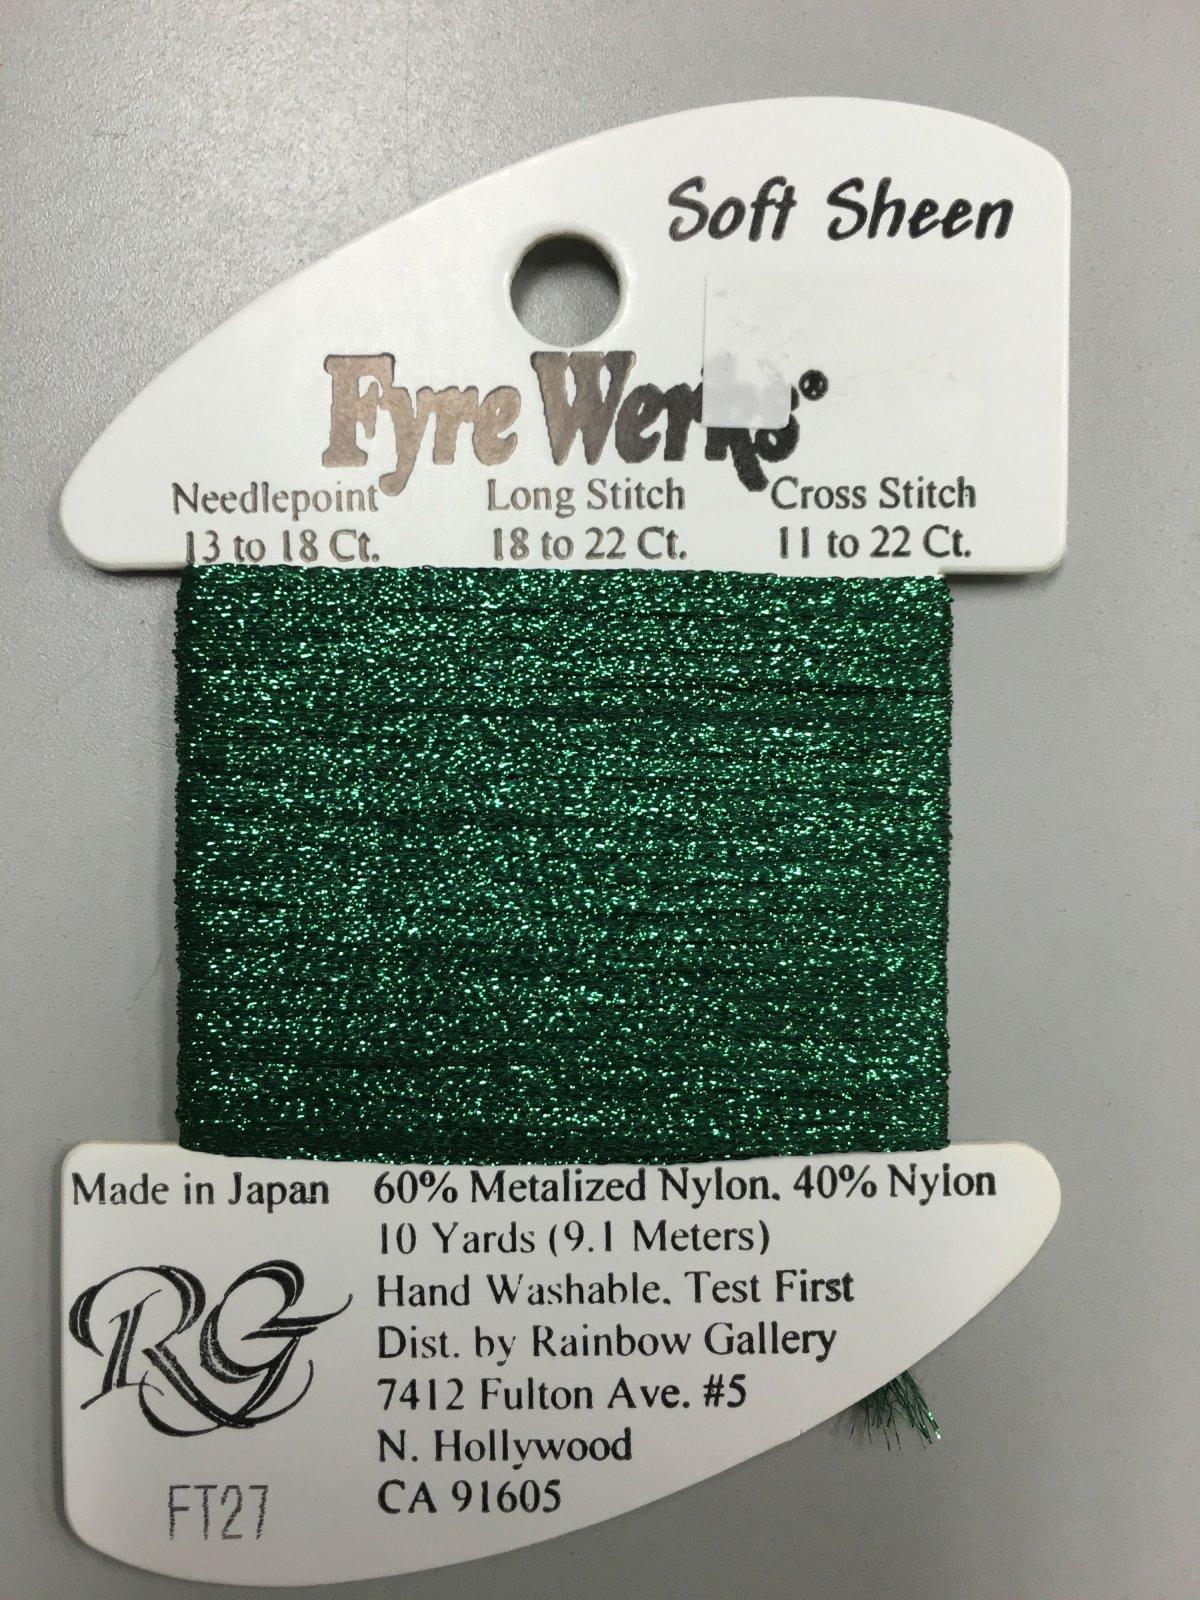 Fyre Werks Soft Sheen FT27